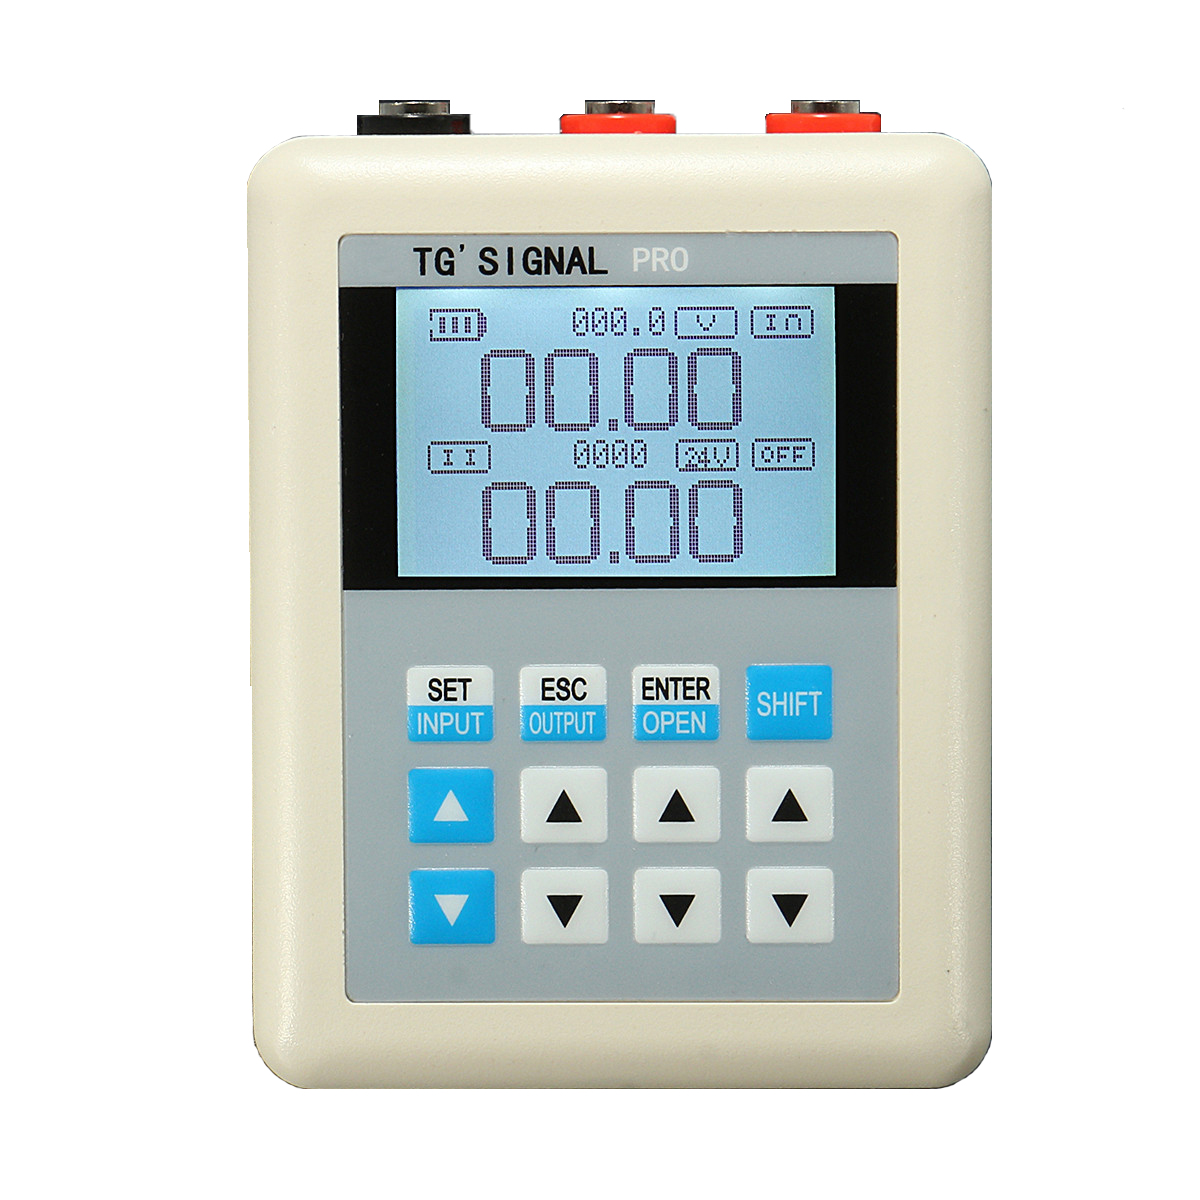 все цены на 4pcs 4-20mA Current Signal Generator 0-10V Voltage Signal Generator Source Transmitter Logger PLC Valve Calibration